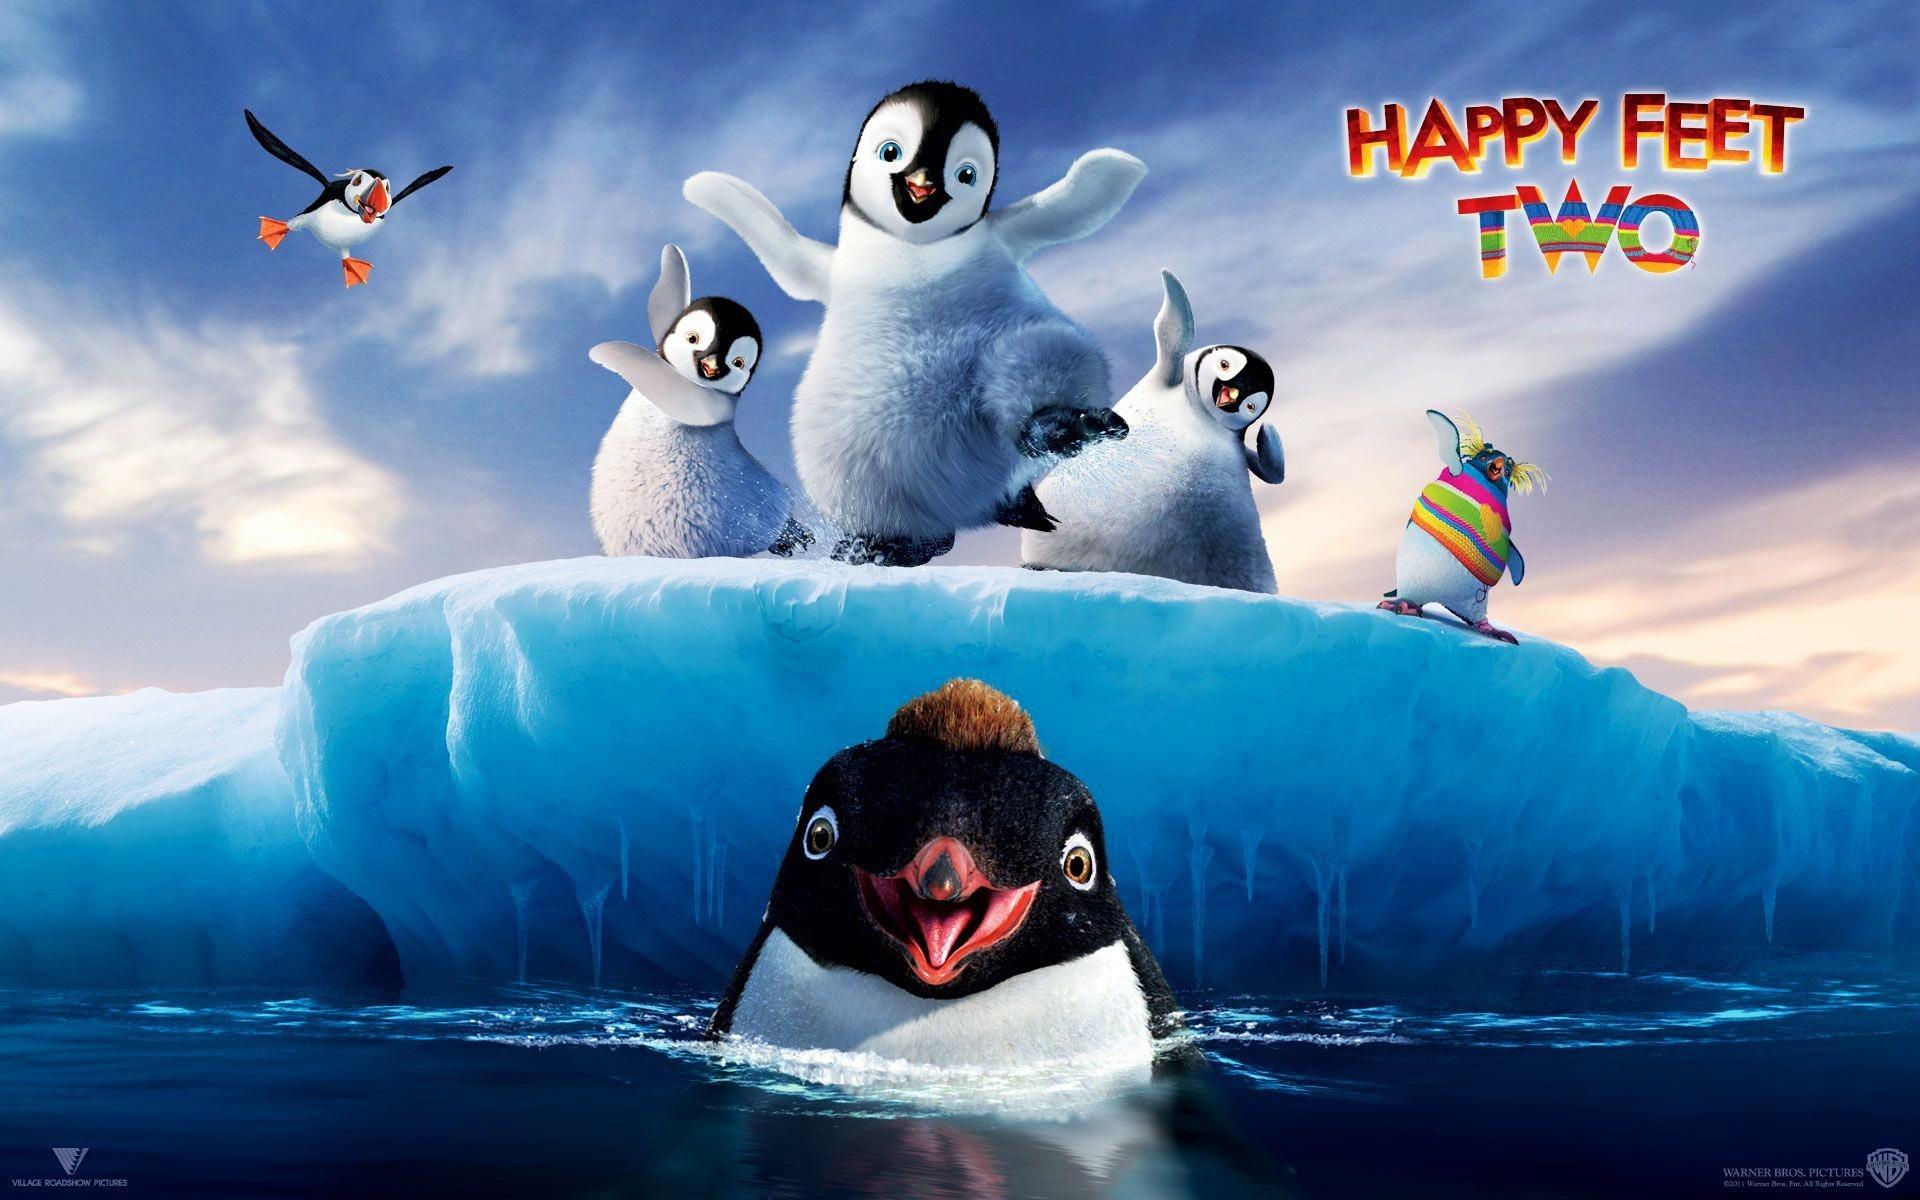 Happy Feet 2 HD Wallpaper Background Image 1920x1200 ID 1920x1200